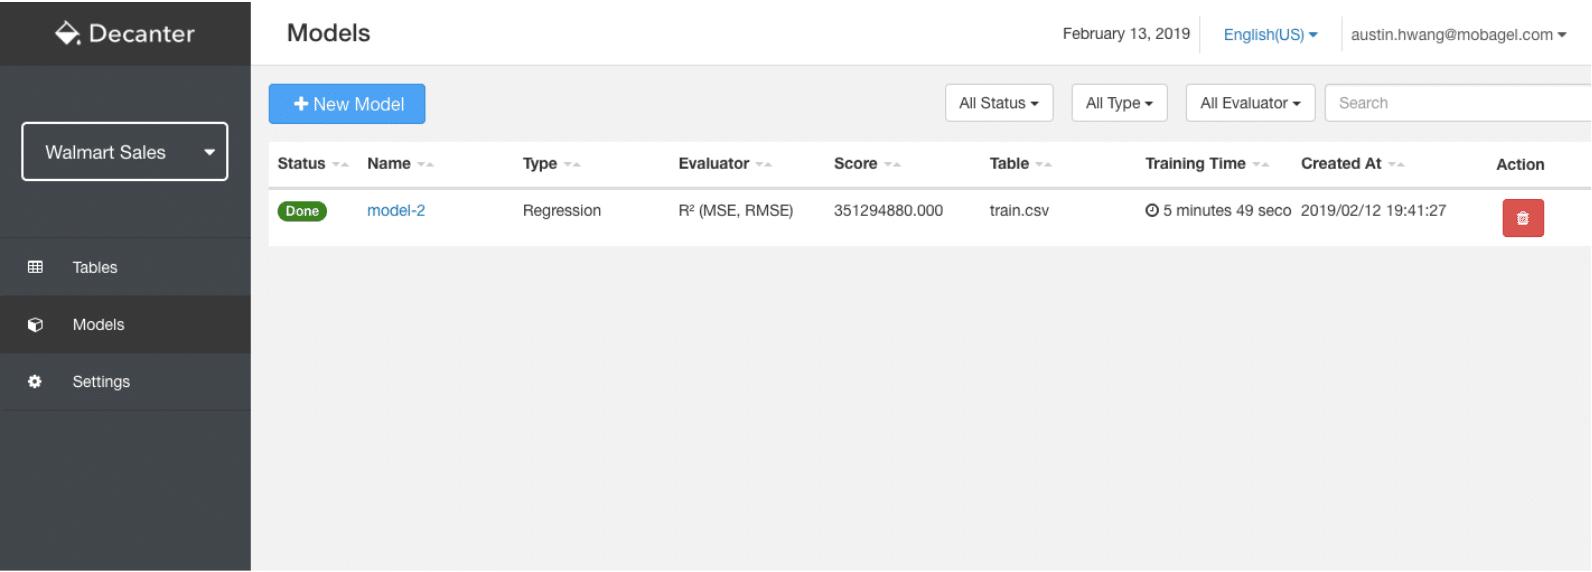 Automated Machine Learning Model Building Excel Decanter AI Mobagel AutoML IBM SAS Datarobot 自動化機器學習 企業數據 提升業績 銷售預測